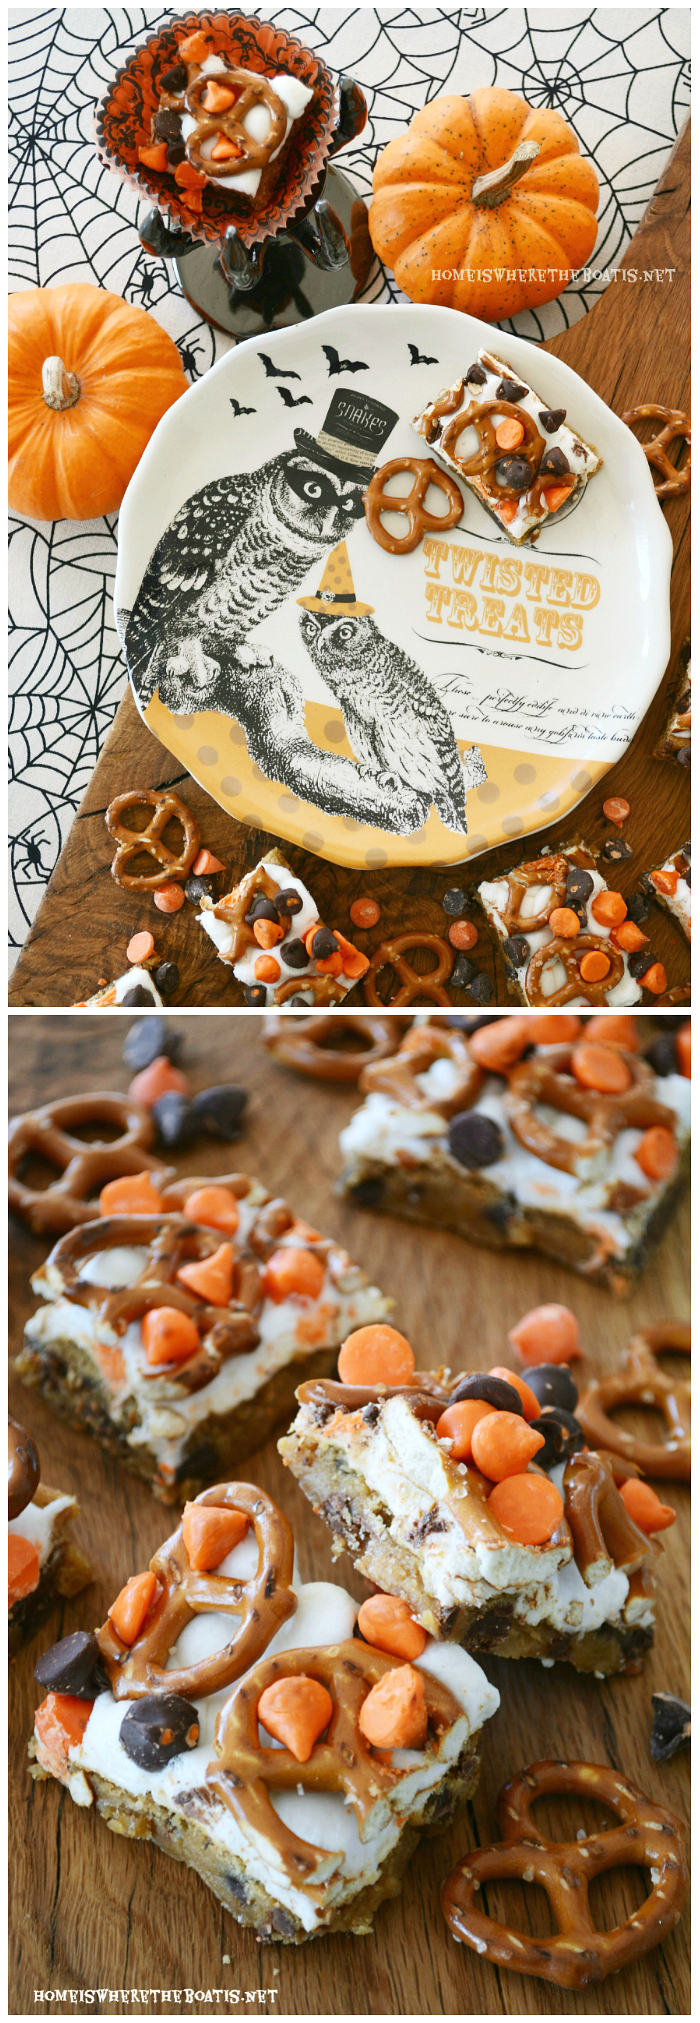 Twisted Treats, aka Pretzel S'mores Chocolate Chip CookieBars | ©homeiswheretheboatis.net #halloween #halloween #smores #recipes